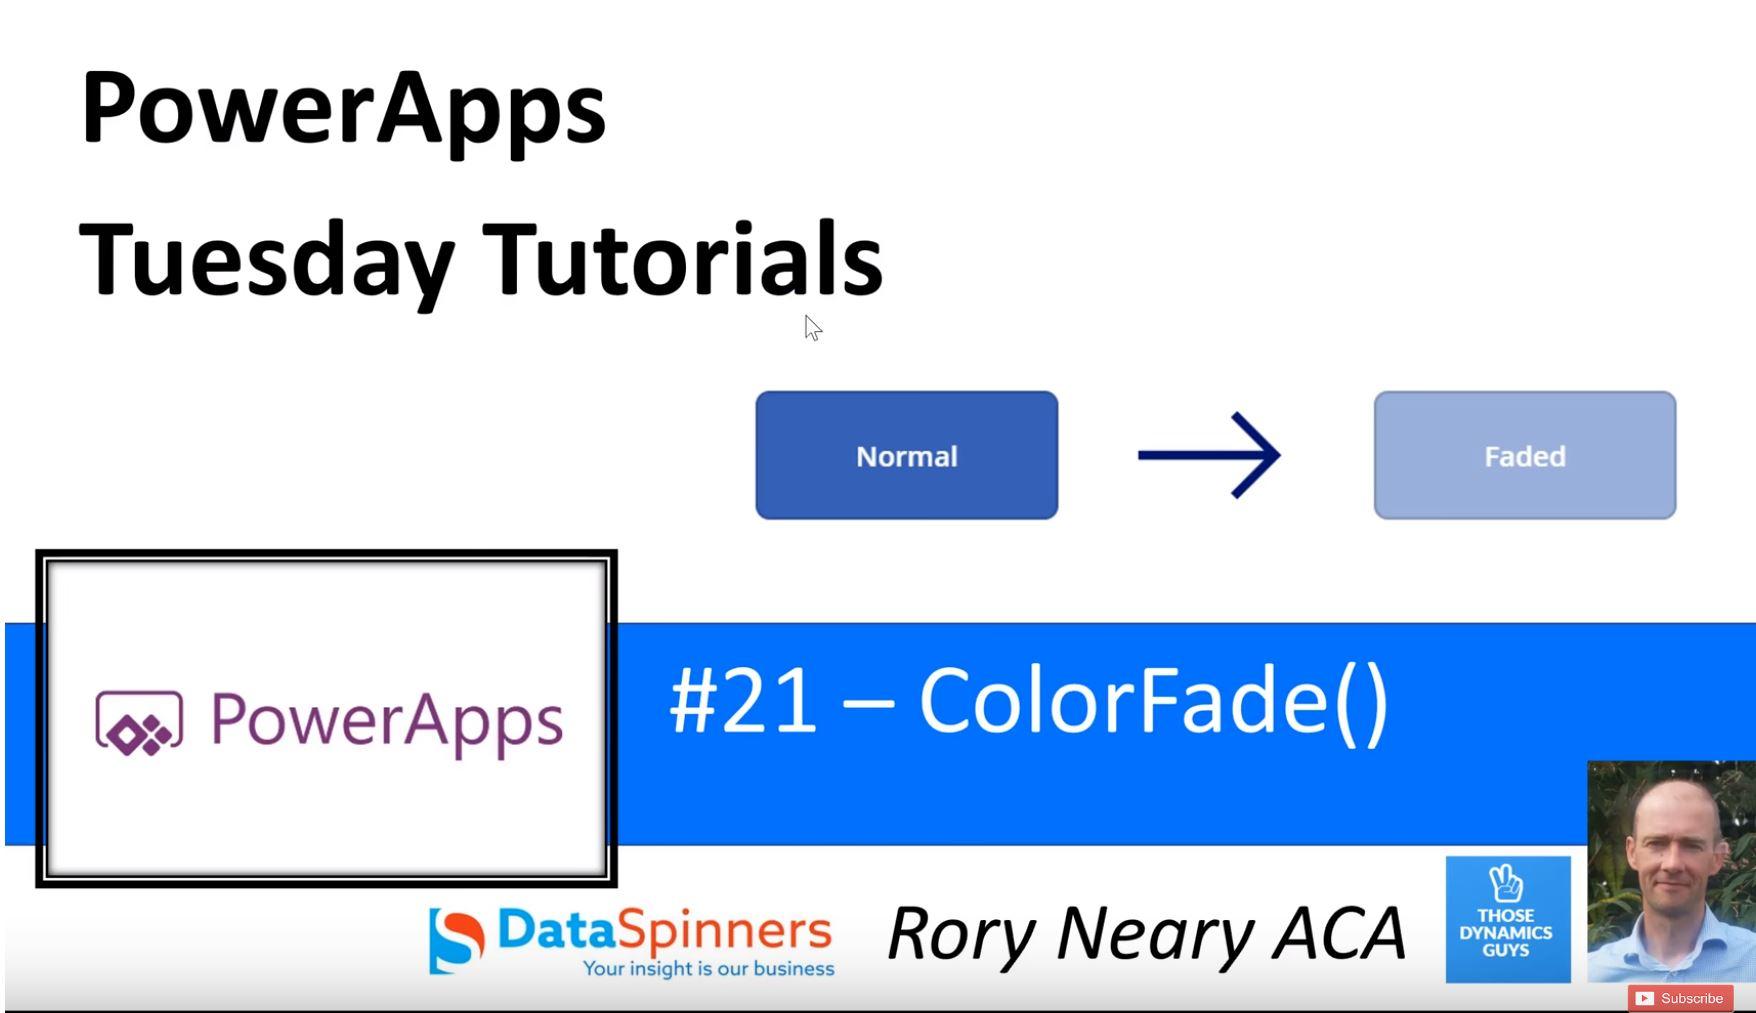 PowerApps Tuesday Tutorials #21 ColorFade